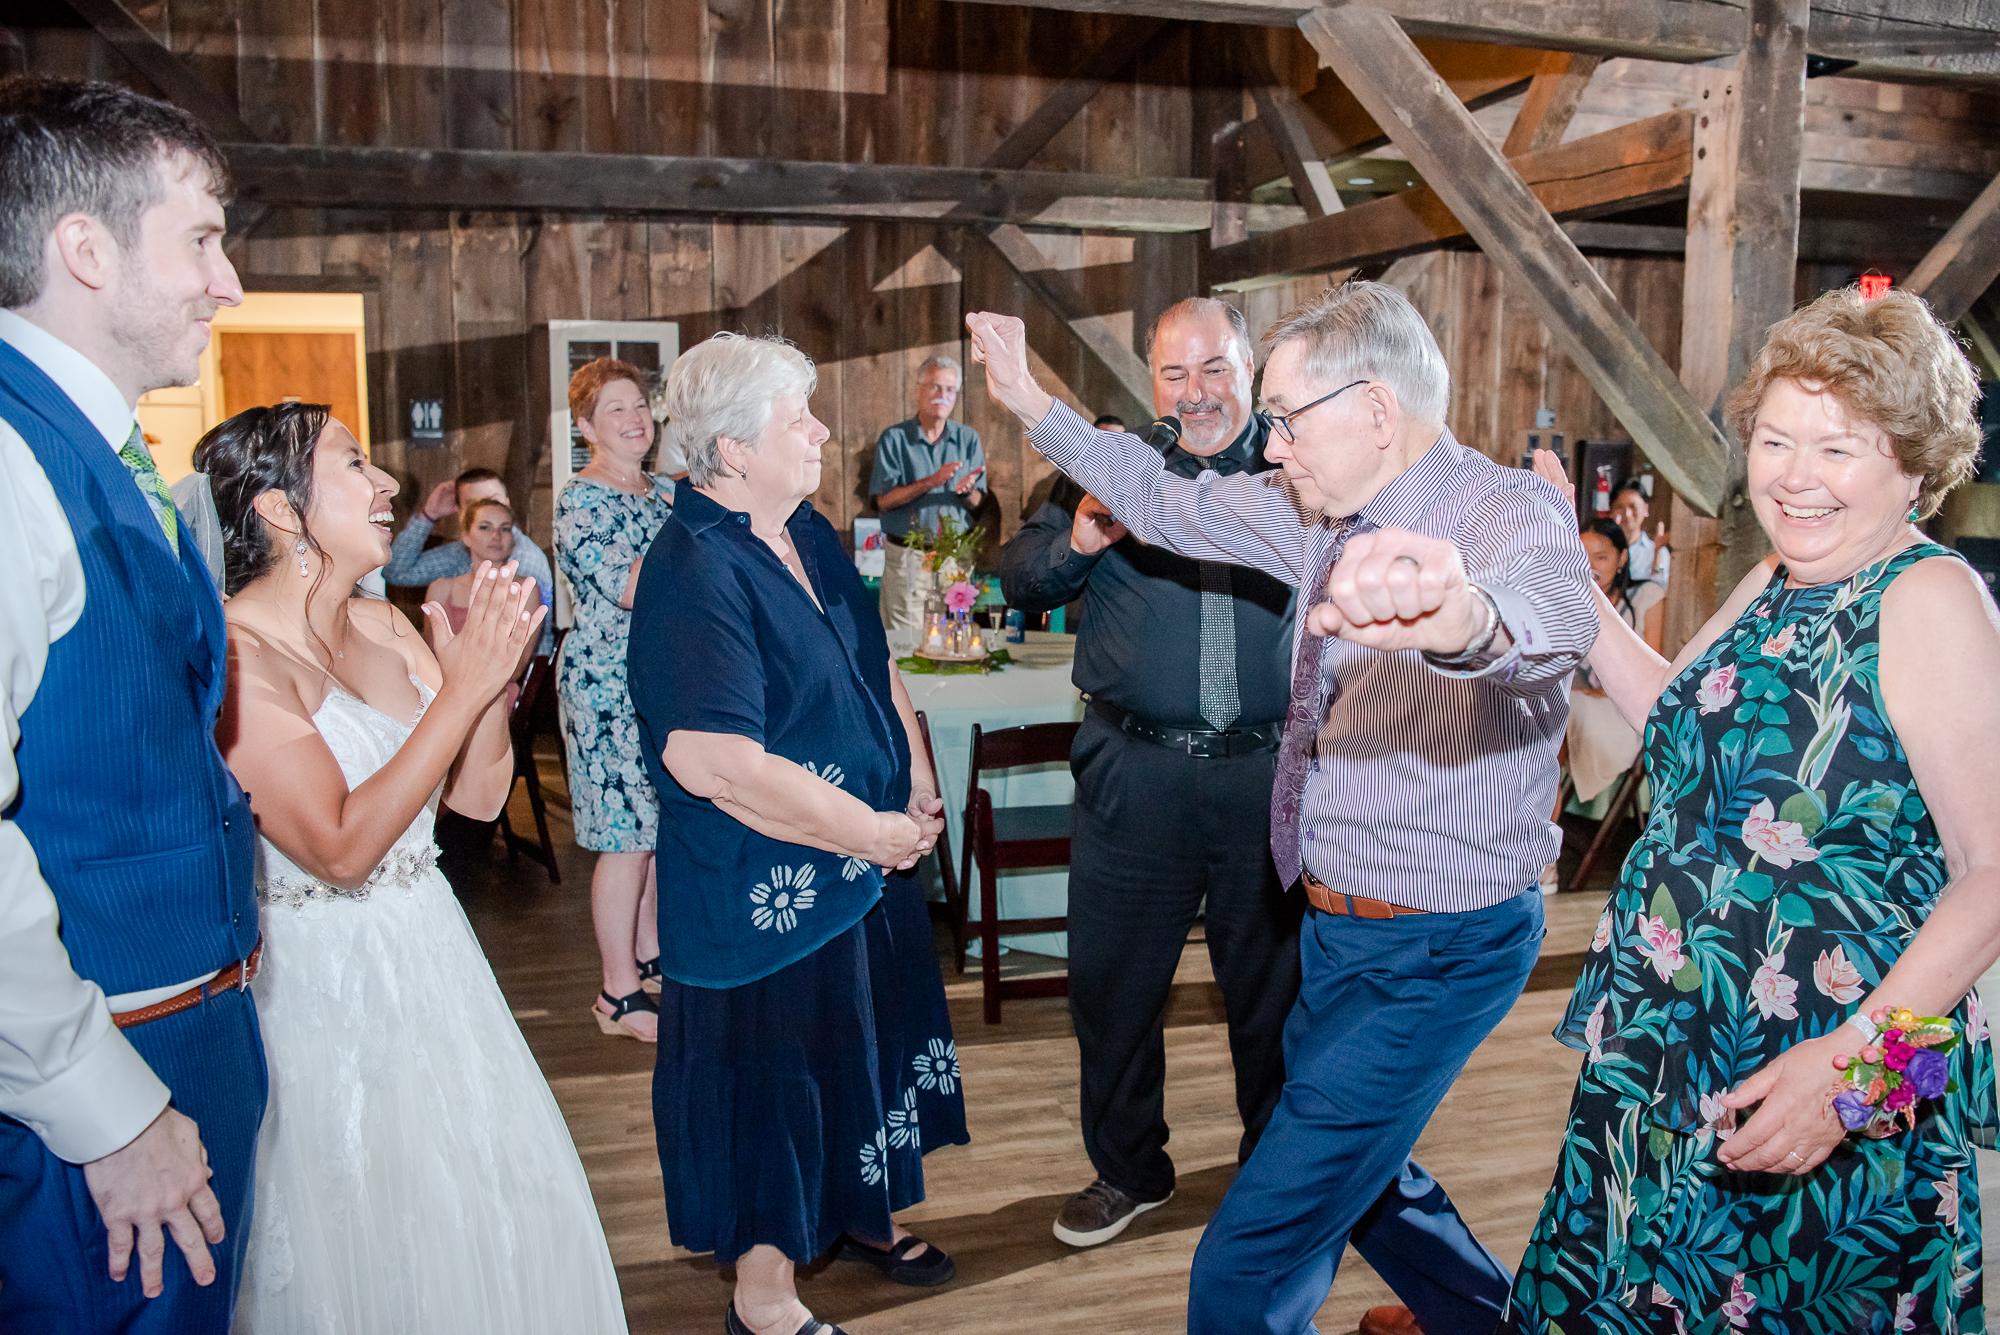 Maria+Adam_Summer Barn Wedding_The Barn at The North Star Preserve_Oberlin_Ohio-225.jpg